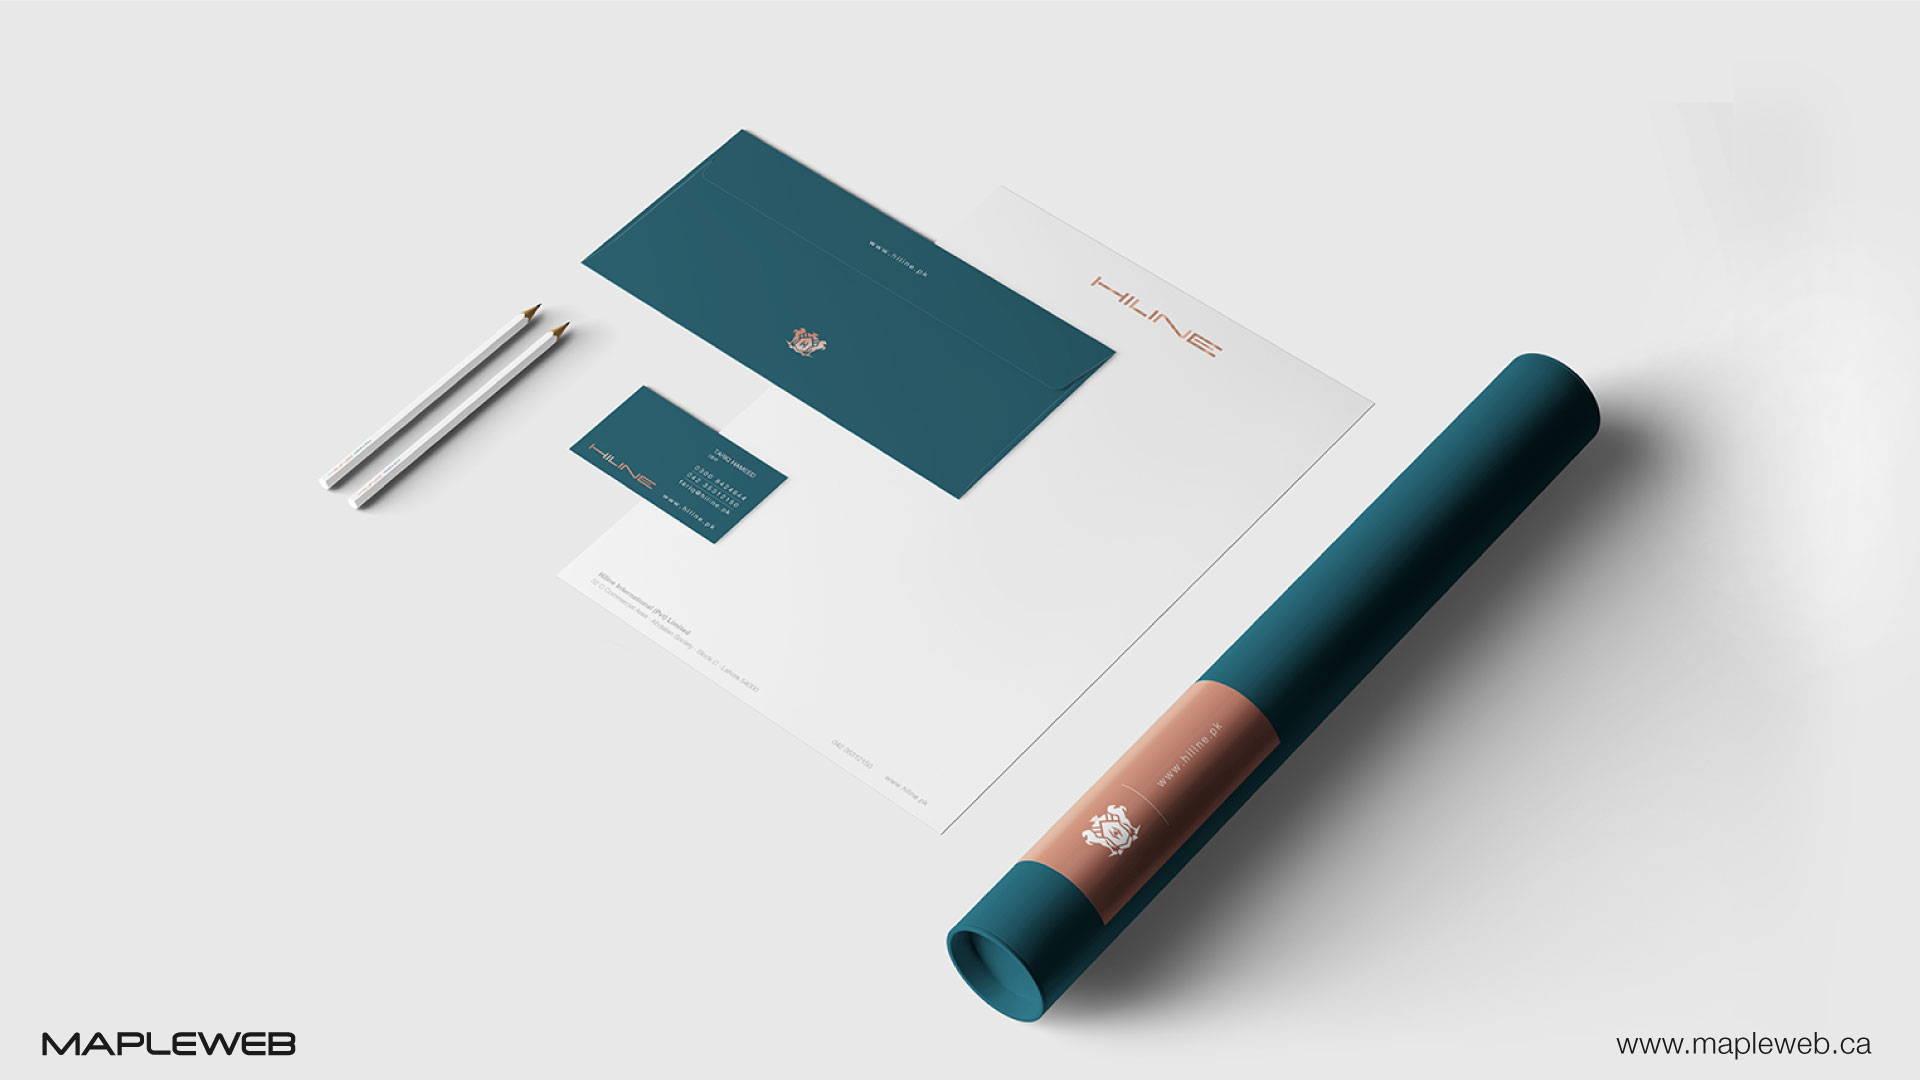 hiline-brand-logo-design-by-mapleweb-vancouver-canada-mug-mock